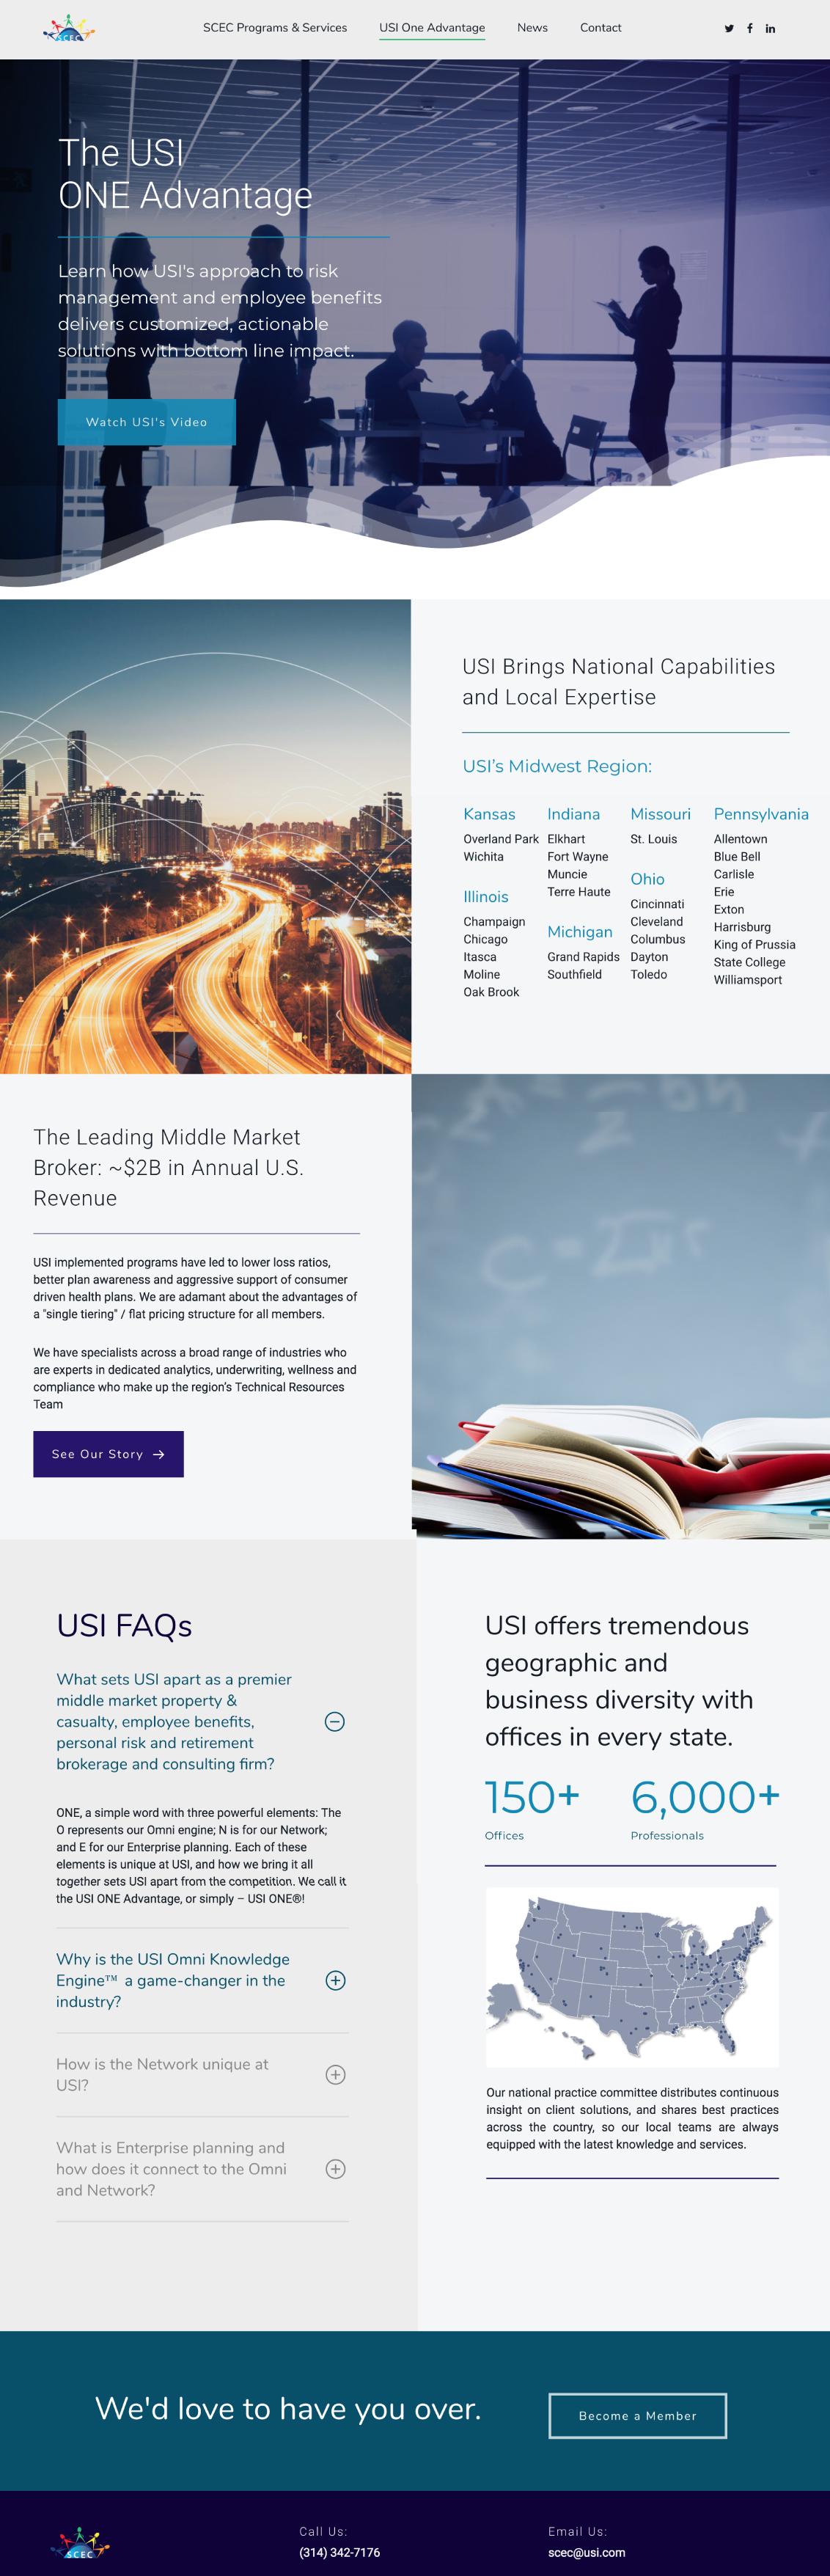 USI Insurance Website Design 2